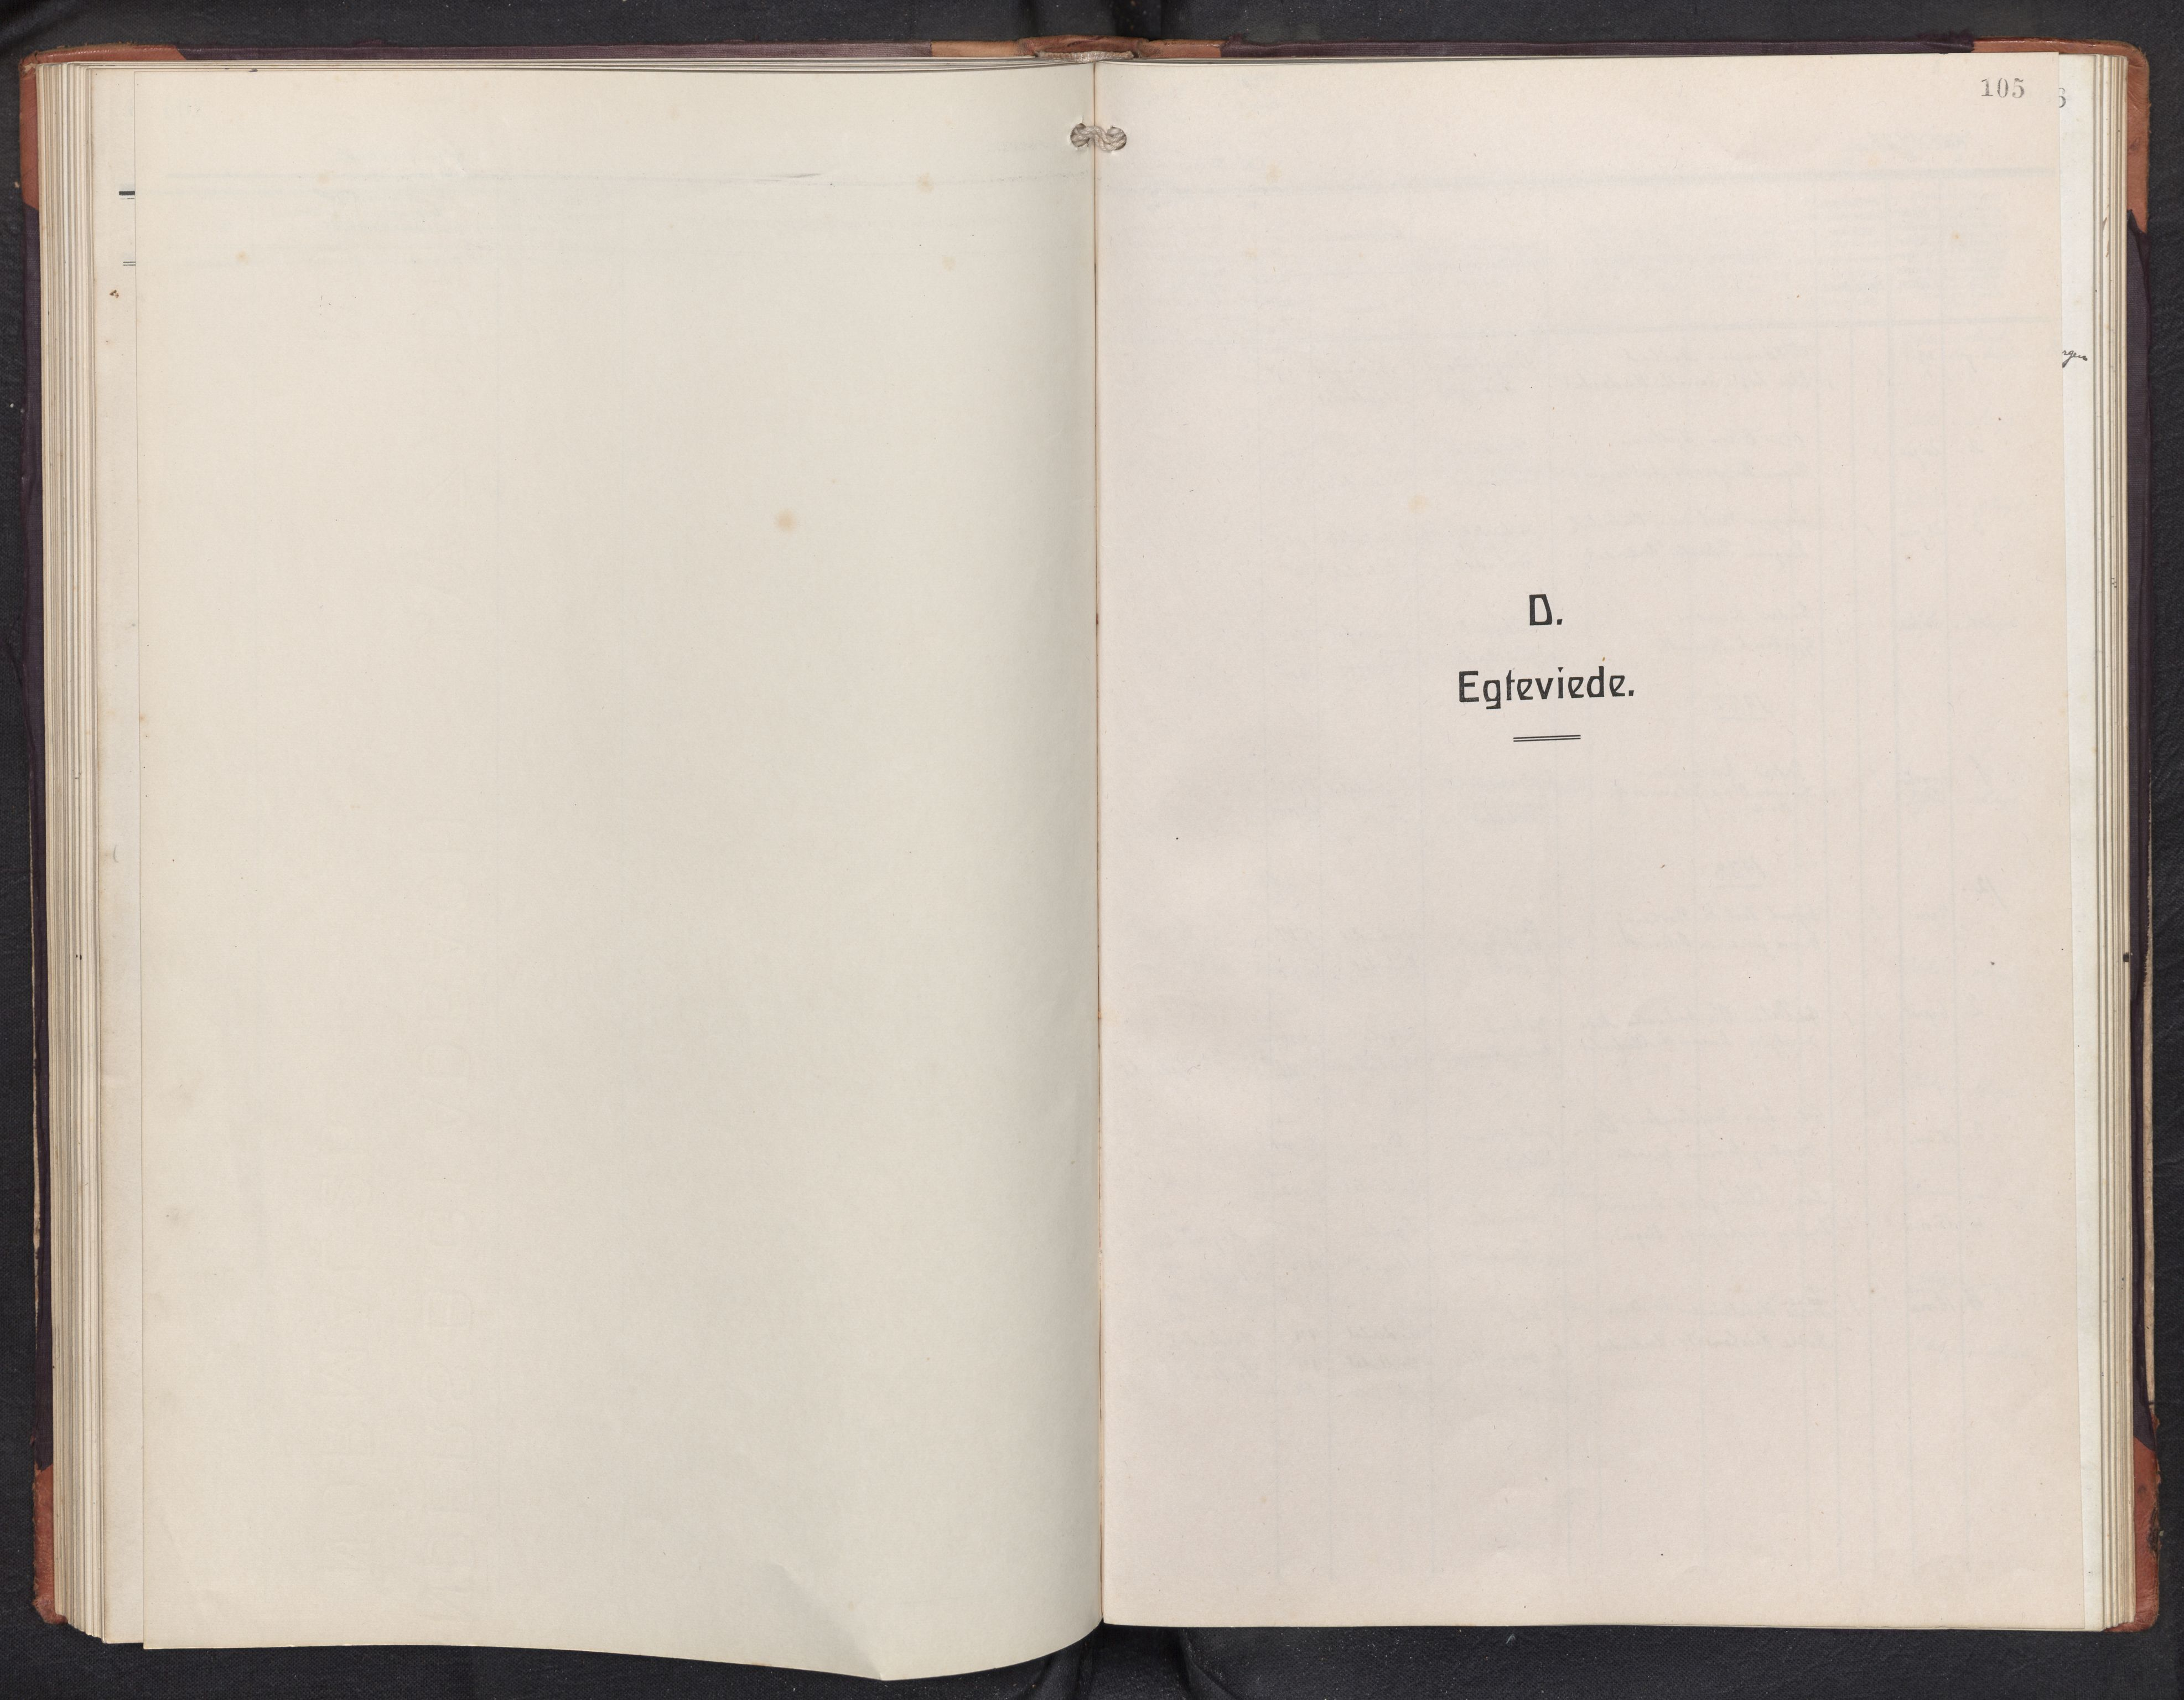 SAB, Aurland Sokneprestembete*, Klokkerbok nr. D 3, 1920-1968, s. 104b-105a